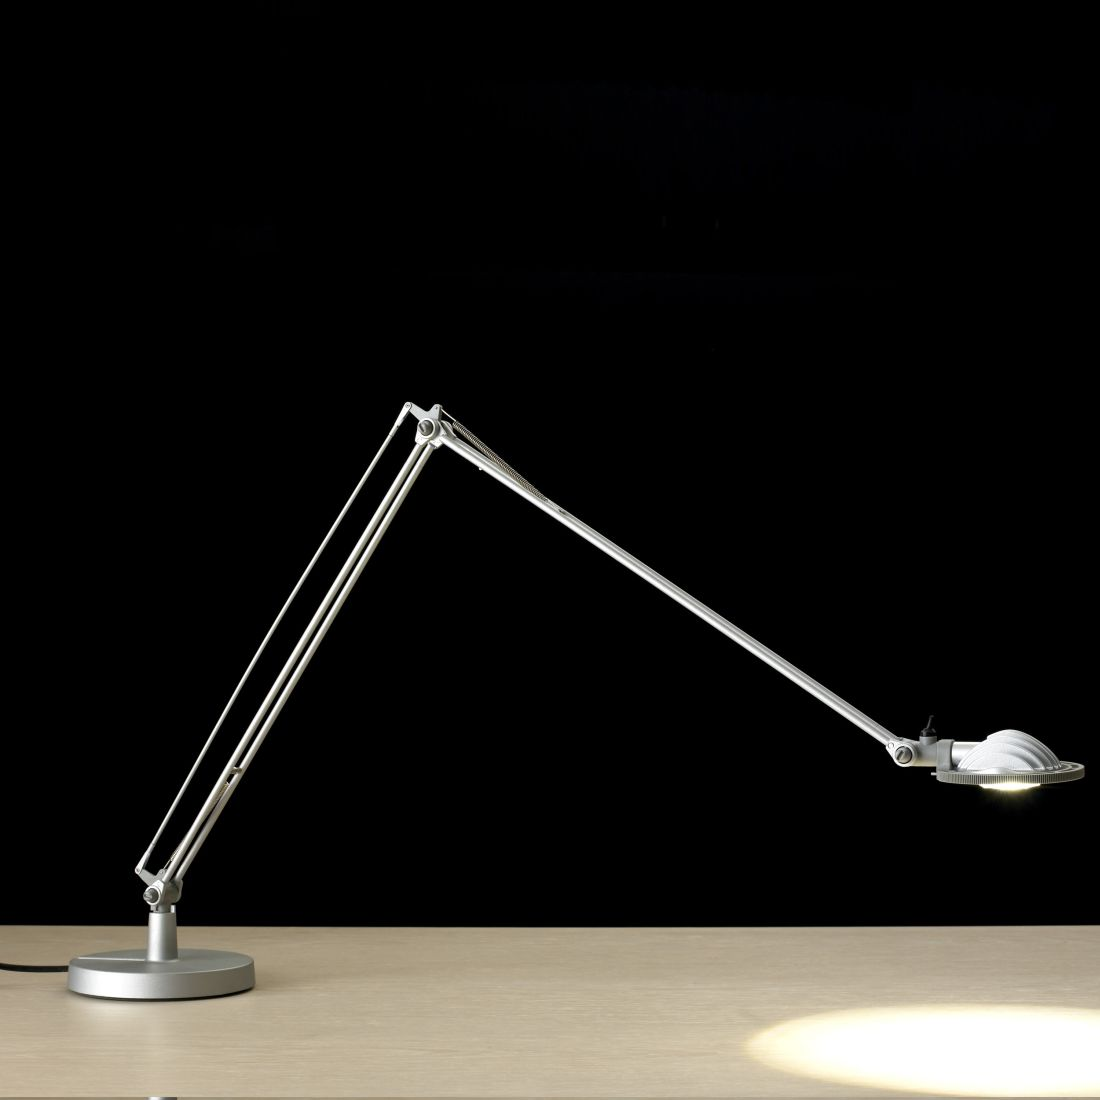 Tischleuchte Berenice LED ● Aluminium ● Schwarz- Luceplan